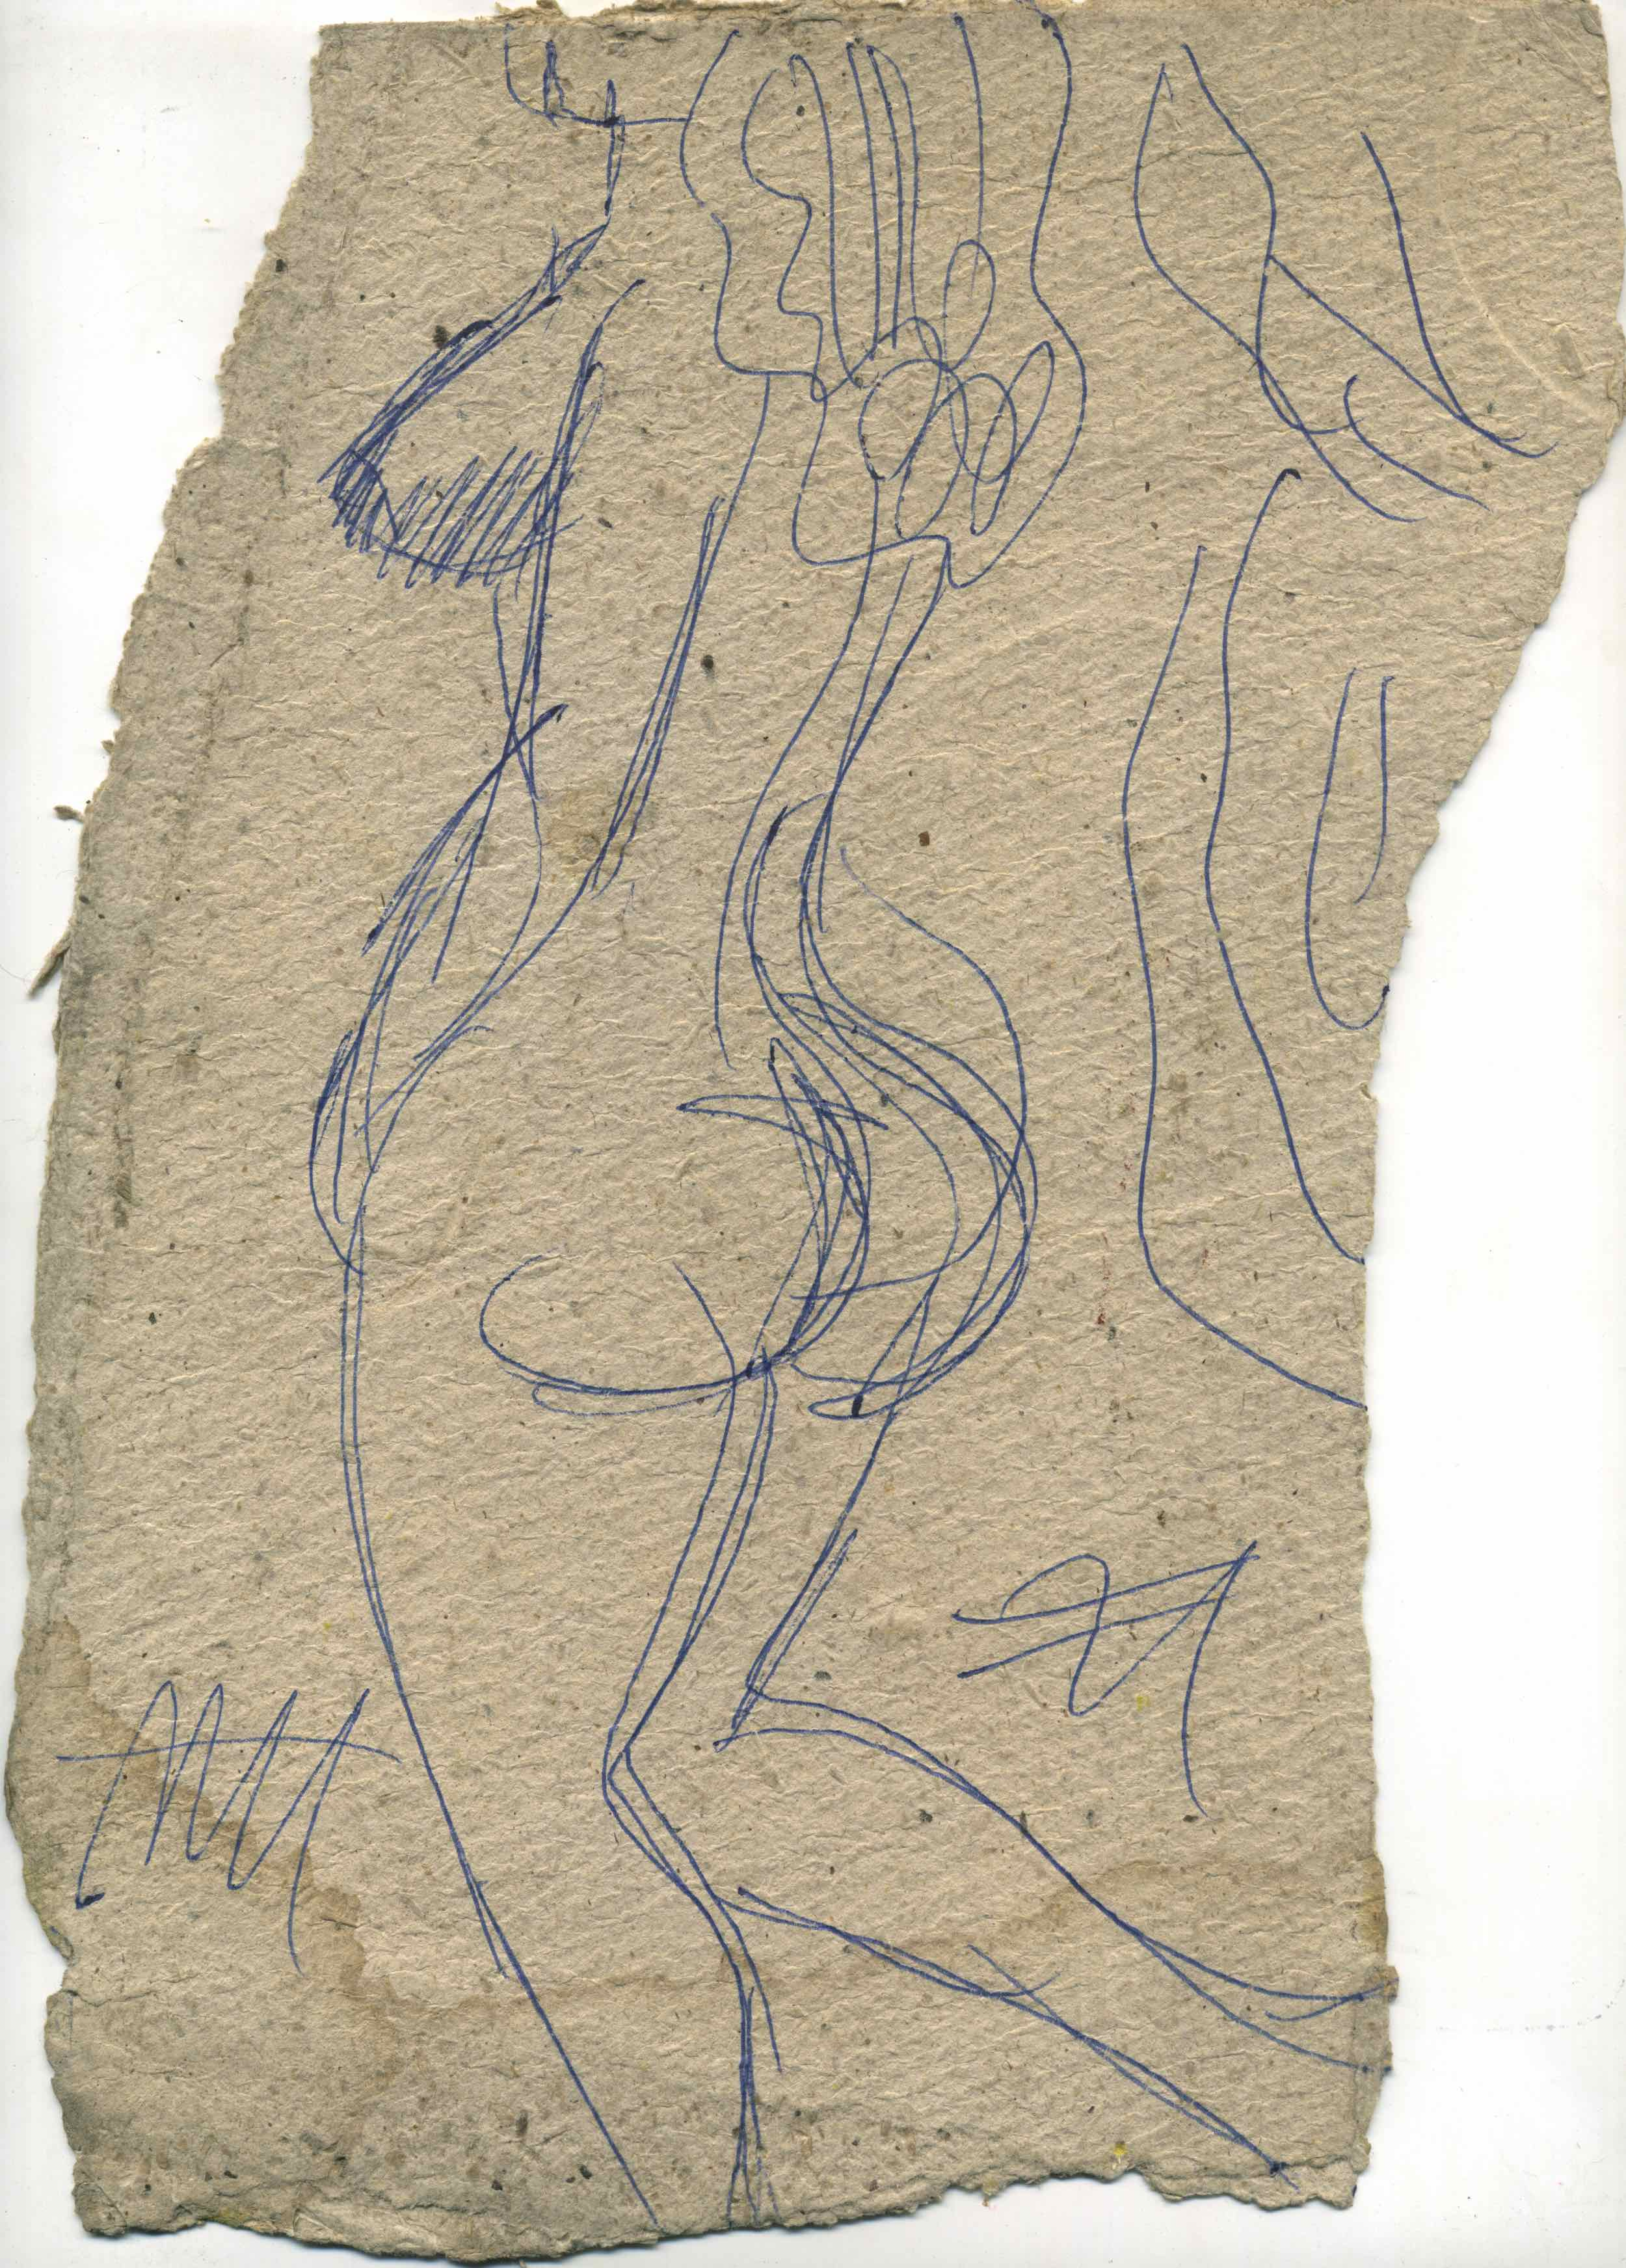 Miroslav Tichý    Untitled   Ink on cardboard 11.6 x 8.3 inches 29.5 x 21.1 cm MTi 66